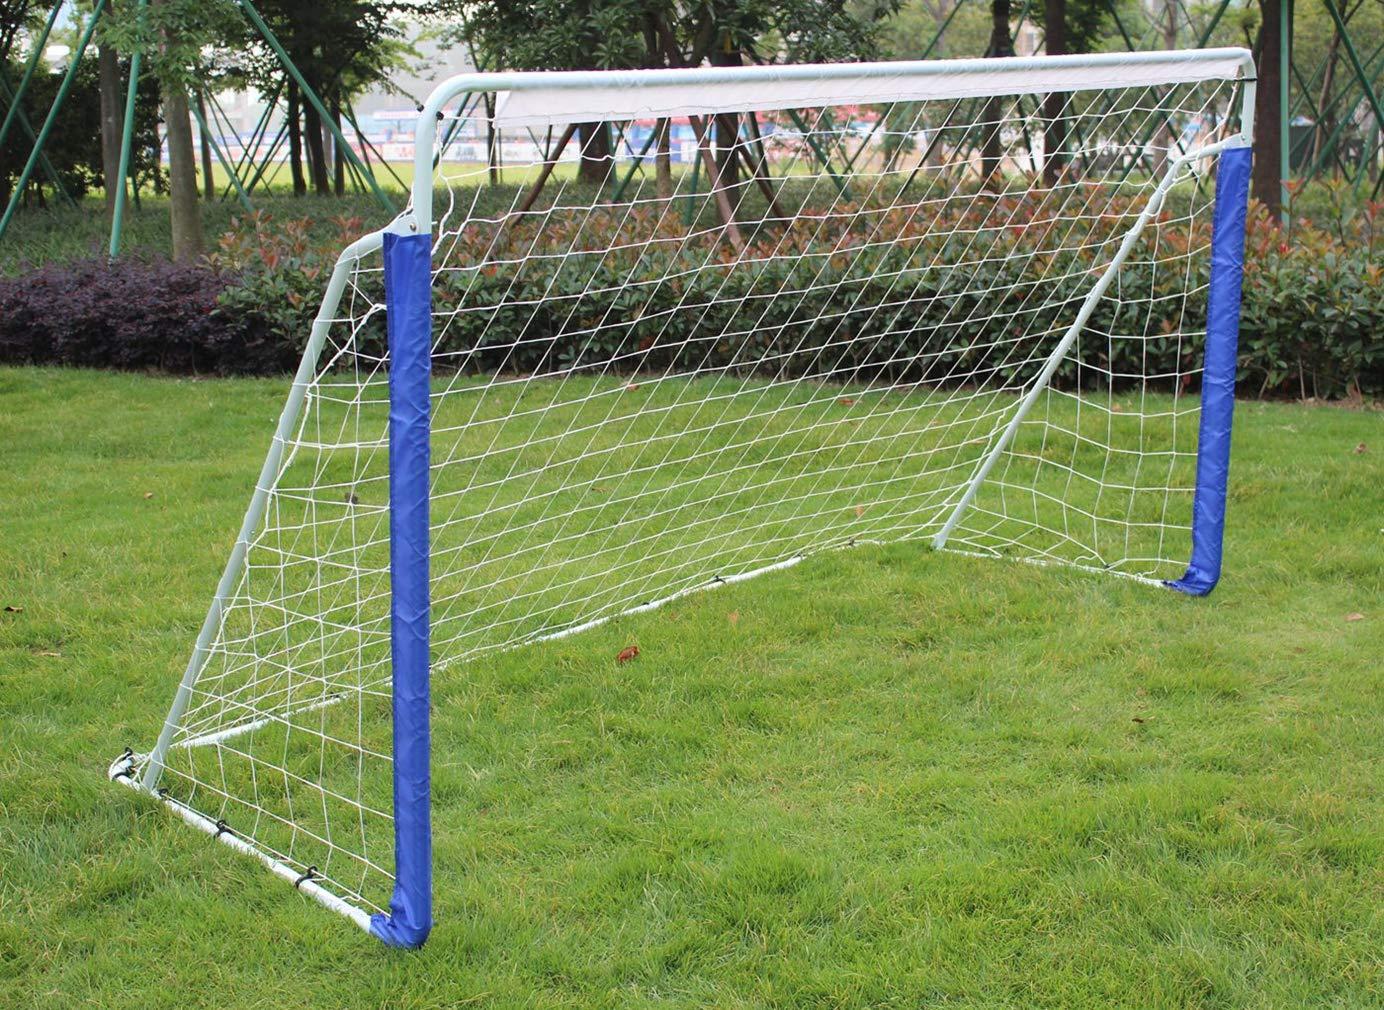 KLB Sport 8' x 5' Steel Soccer Goal - Portable Soccer Net with Carry Bag